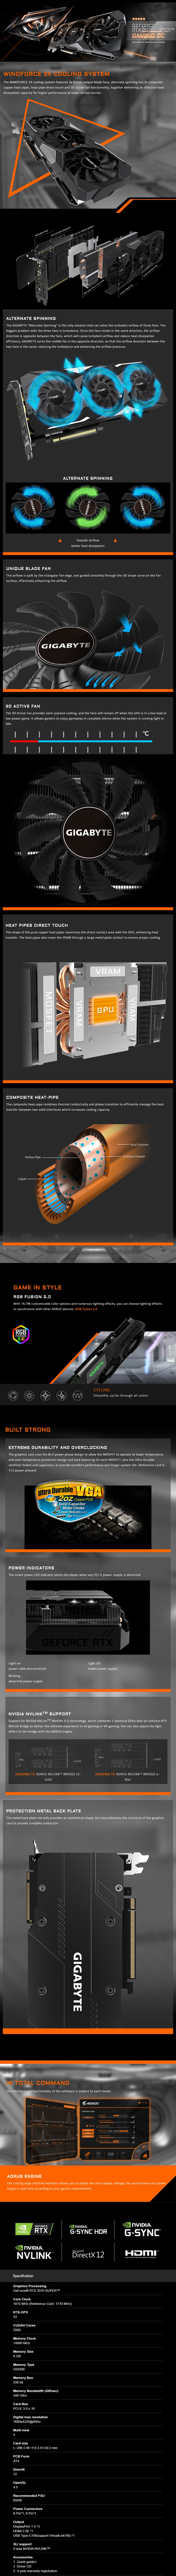 Gigabyte GeForce RTX 2070 Super OC 8GB Video Card - Overview 1